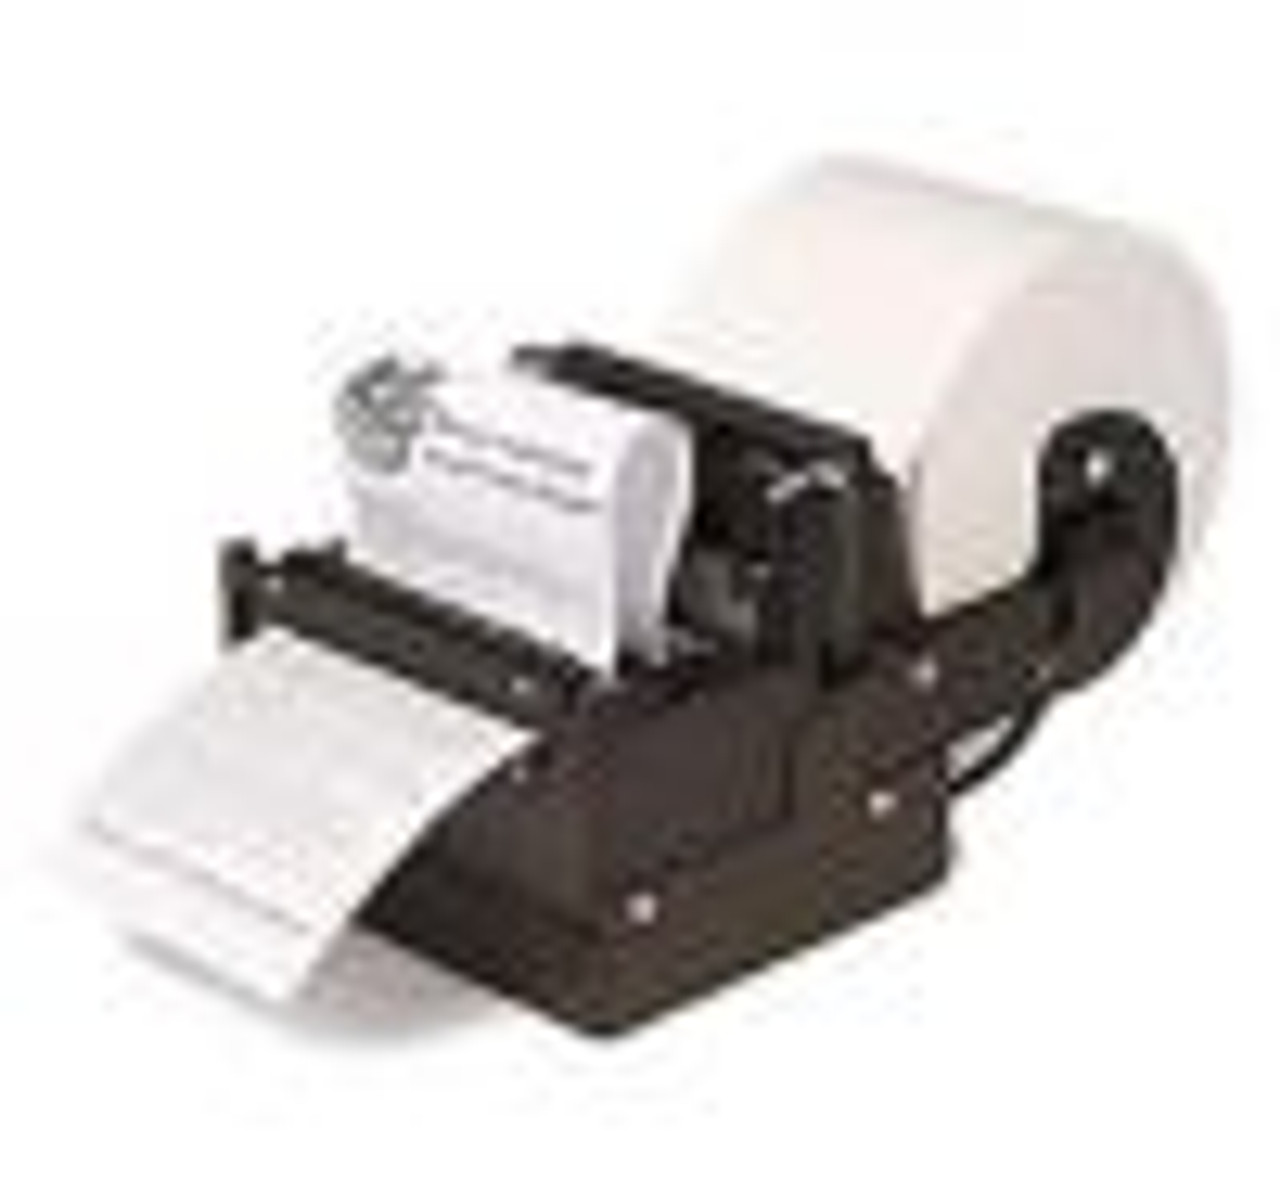 TTP 7030 Printers